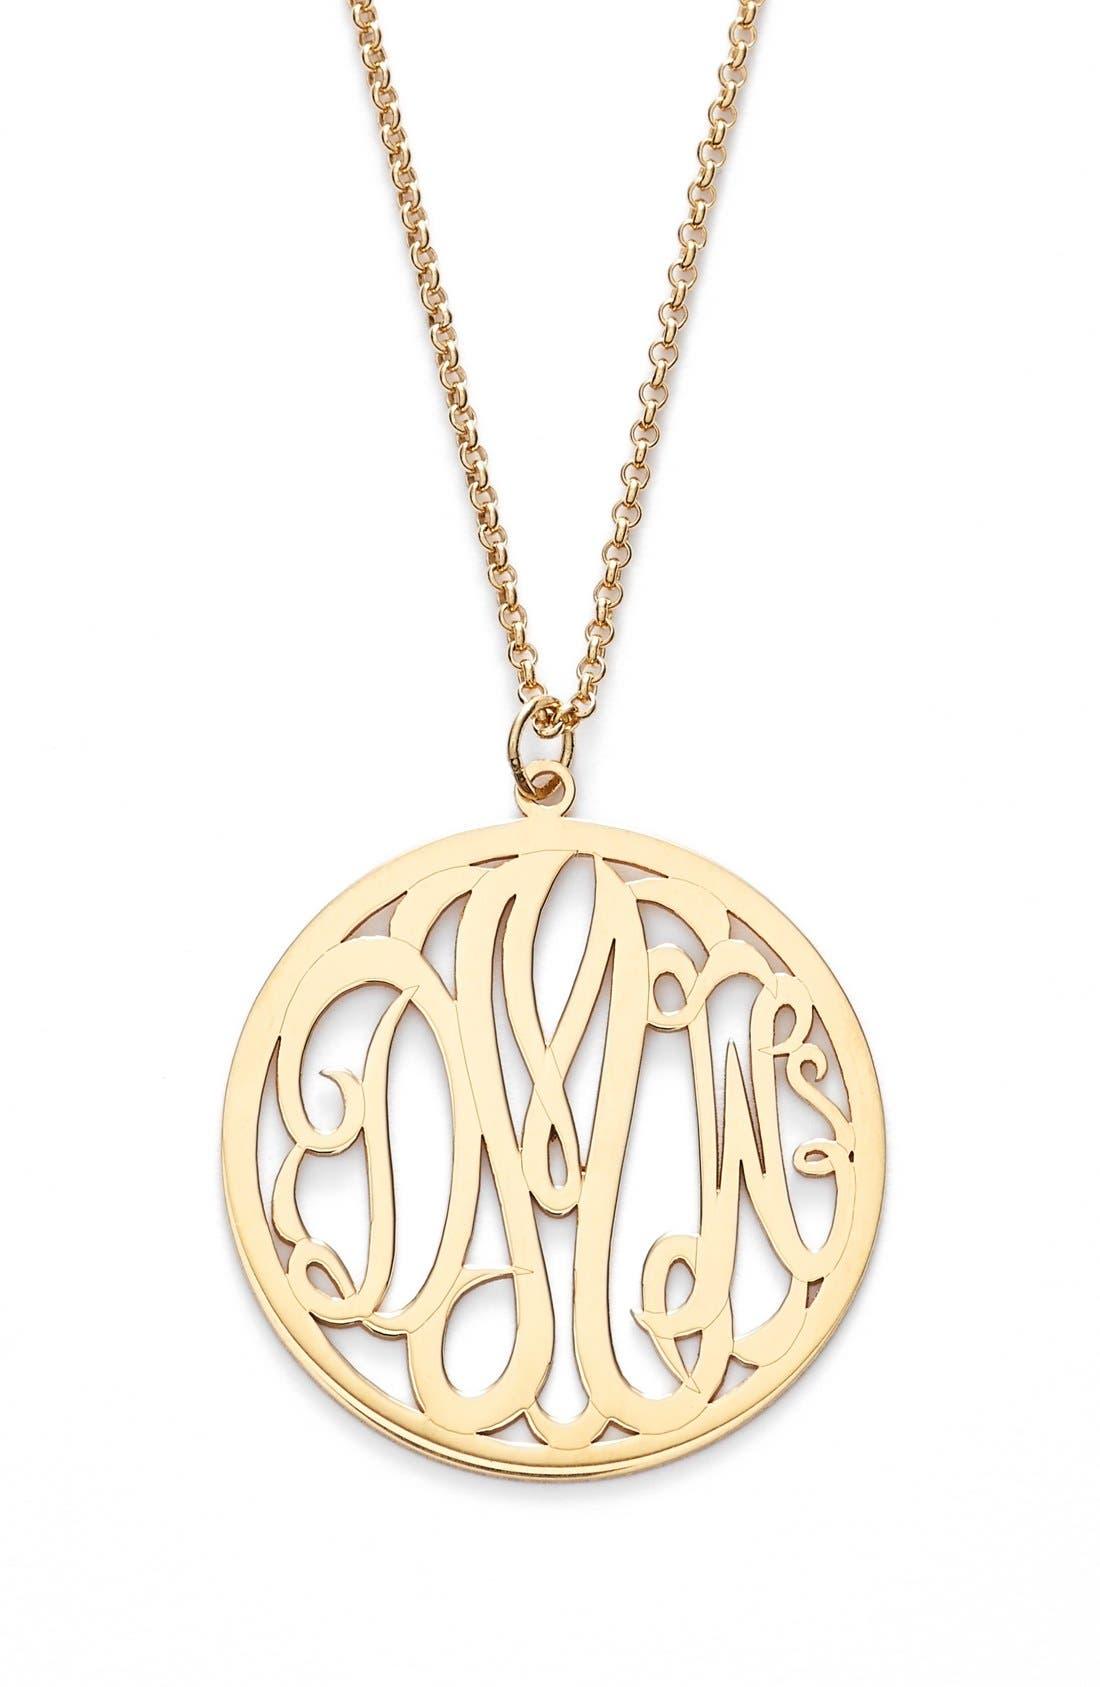 ARGENTO VIVO Personalized 3-Letter Monogram Necklace